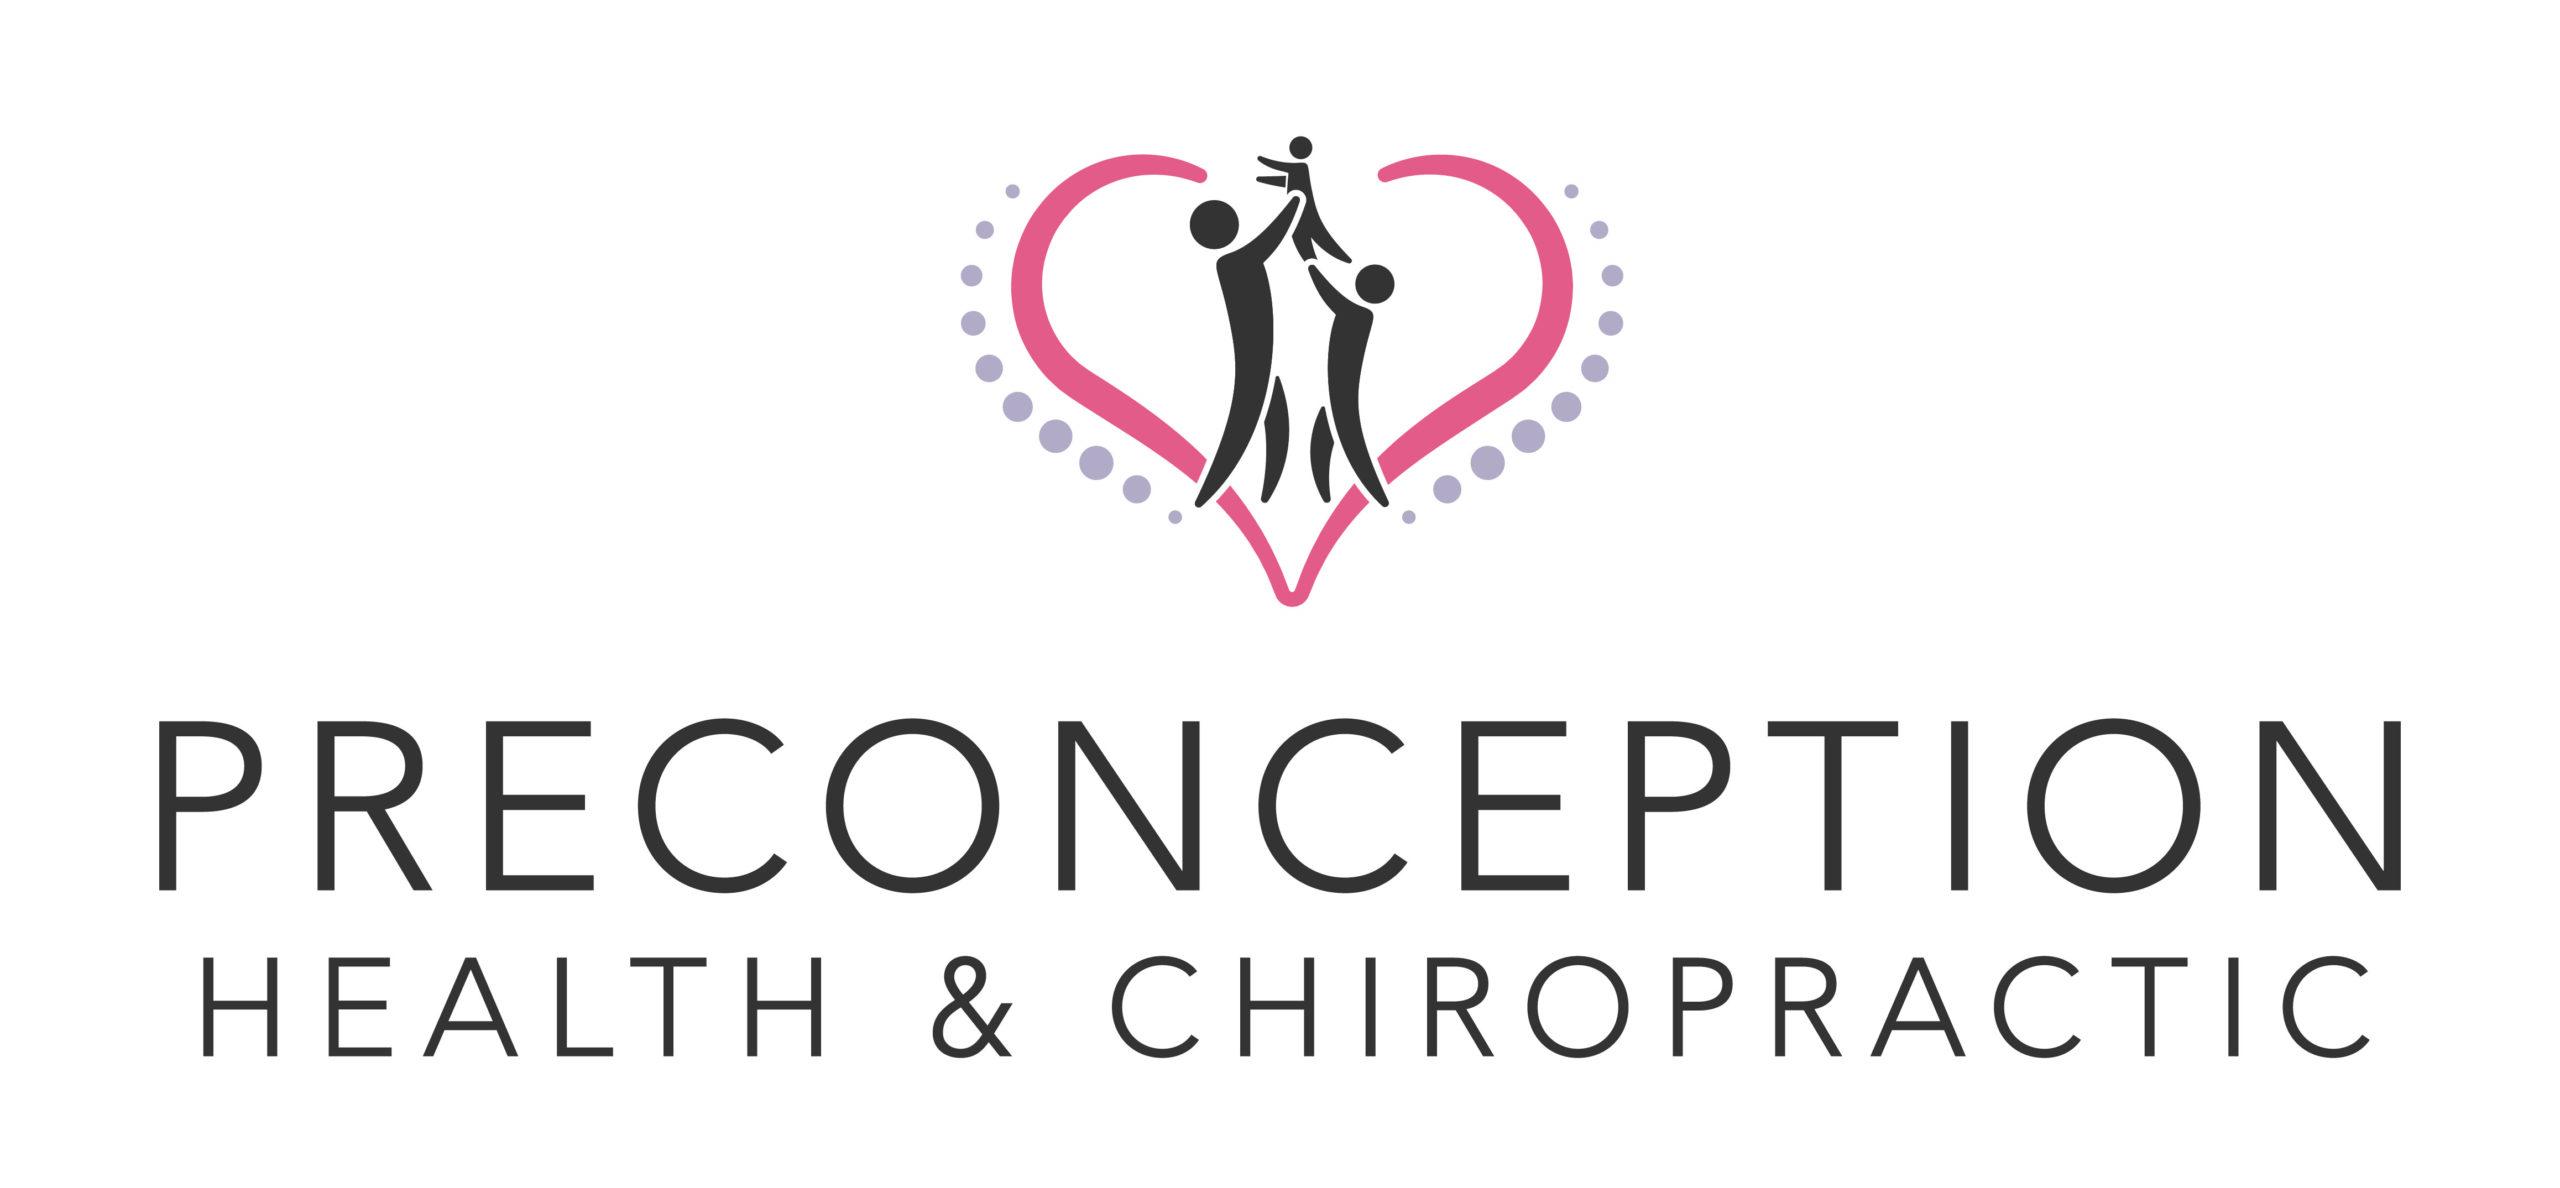 Preconception Health & Chiropractic